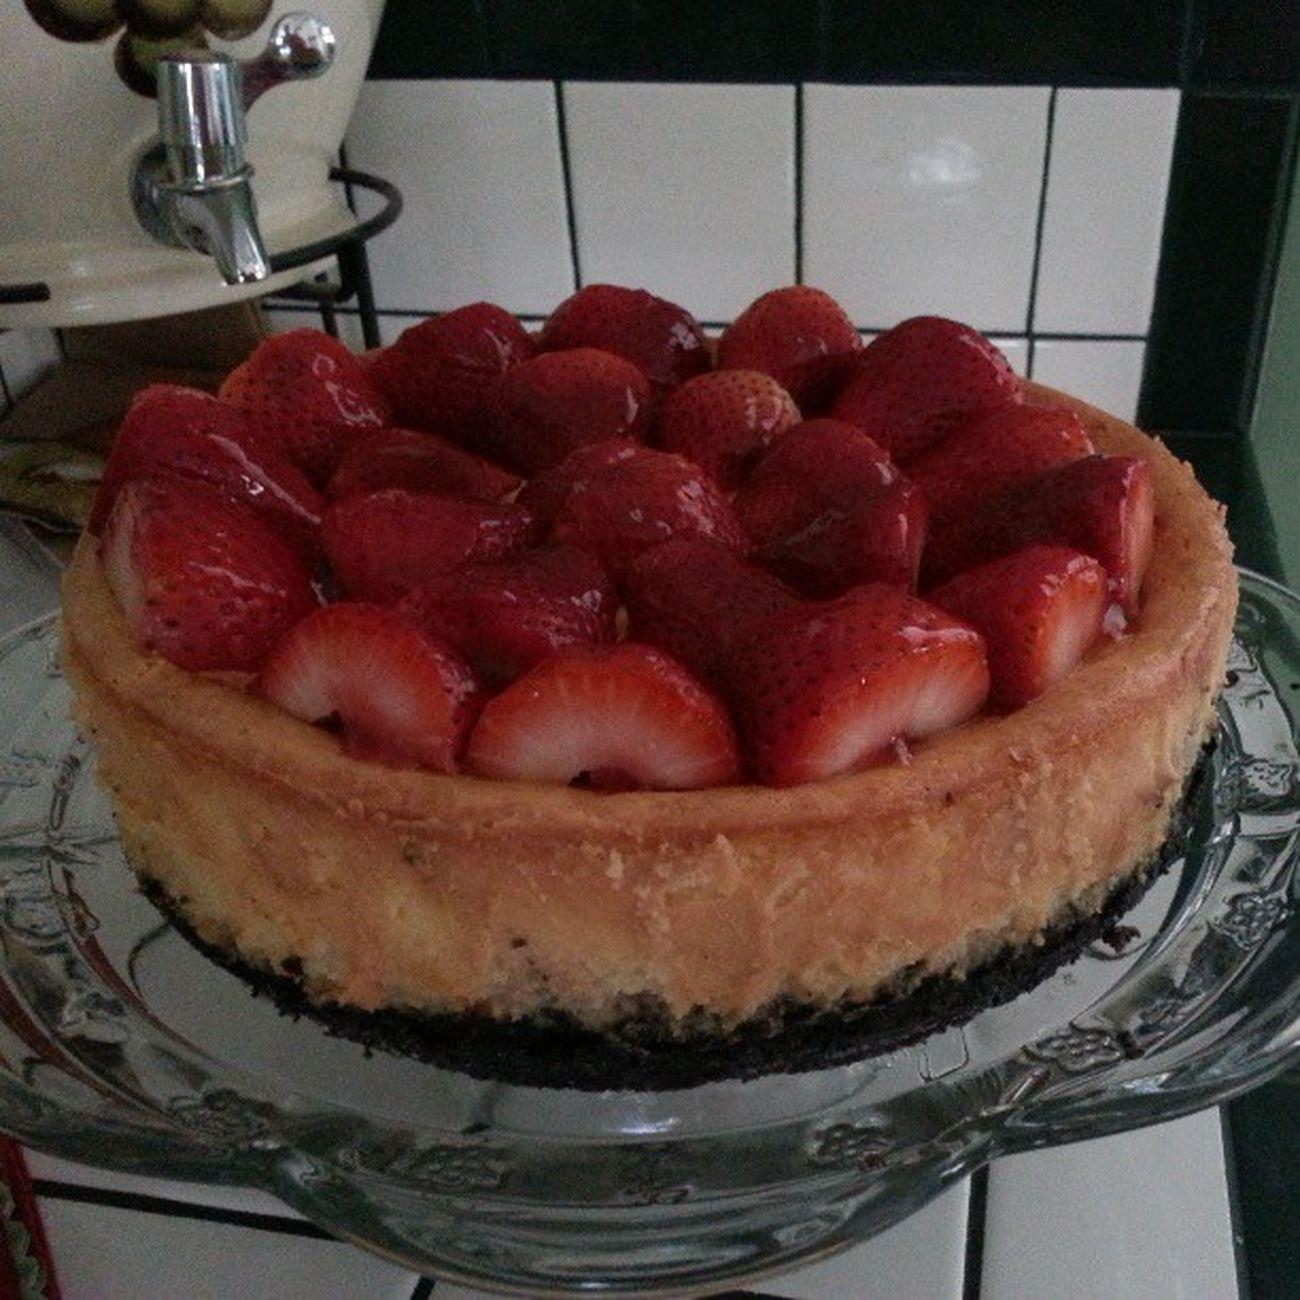 Cheese Cake Homemade Insanelyyummy Strawberry Whitechocolate Todiefor Elegant Sweets Sweet